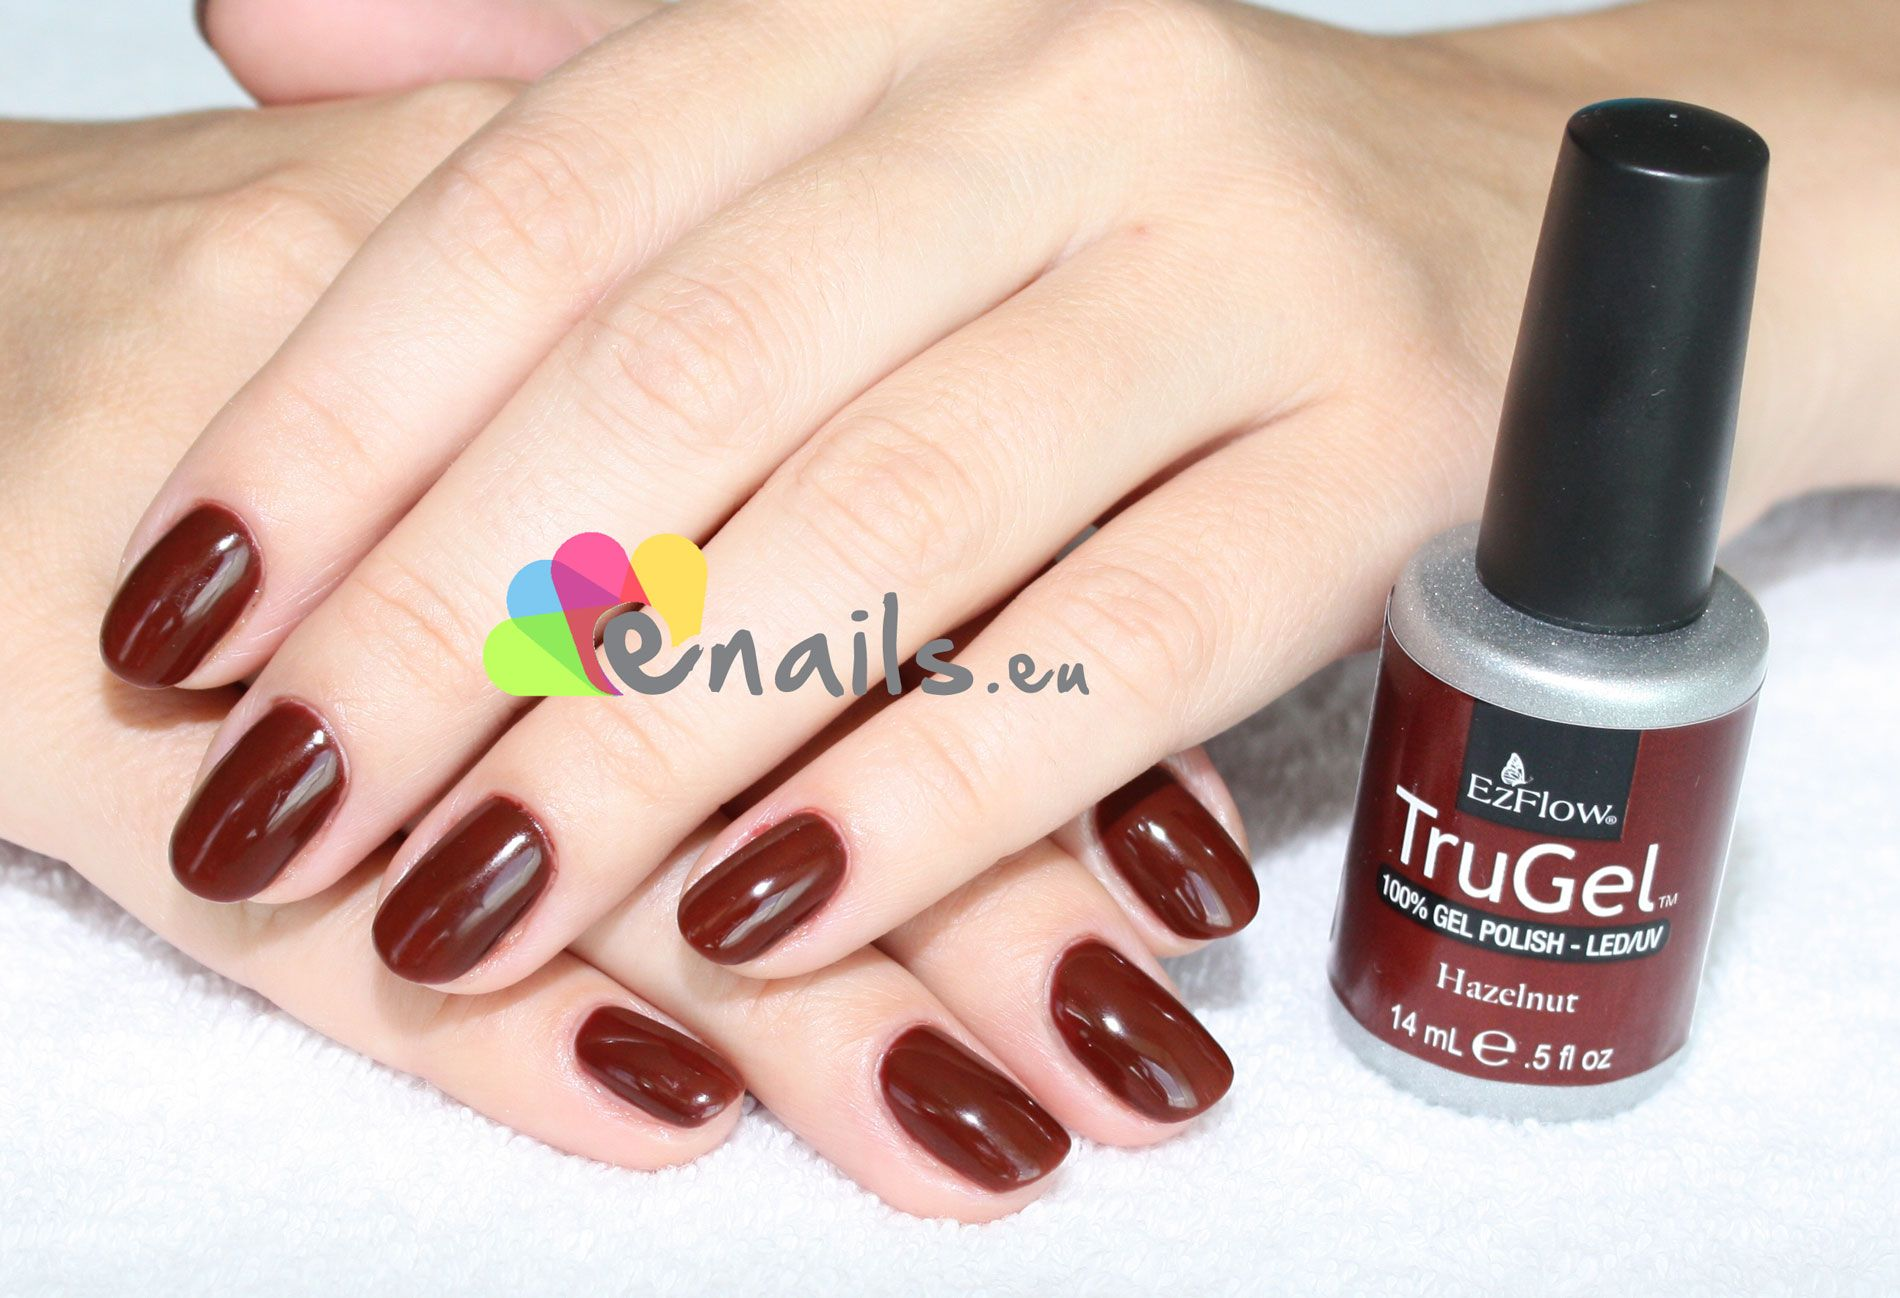 Hazelnut * EzFlow TruGel | Online shop: http://www.enails.eu ...